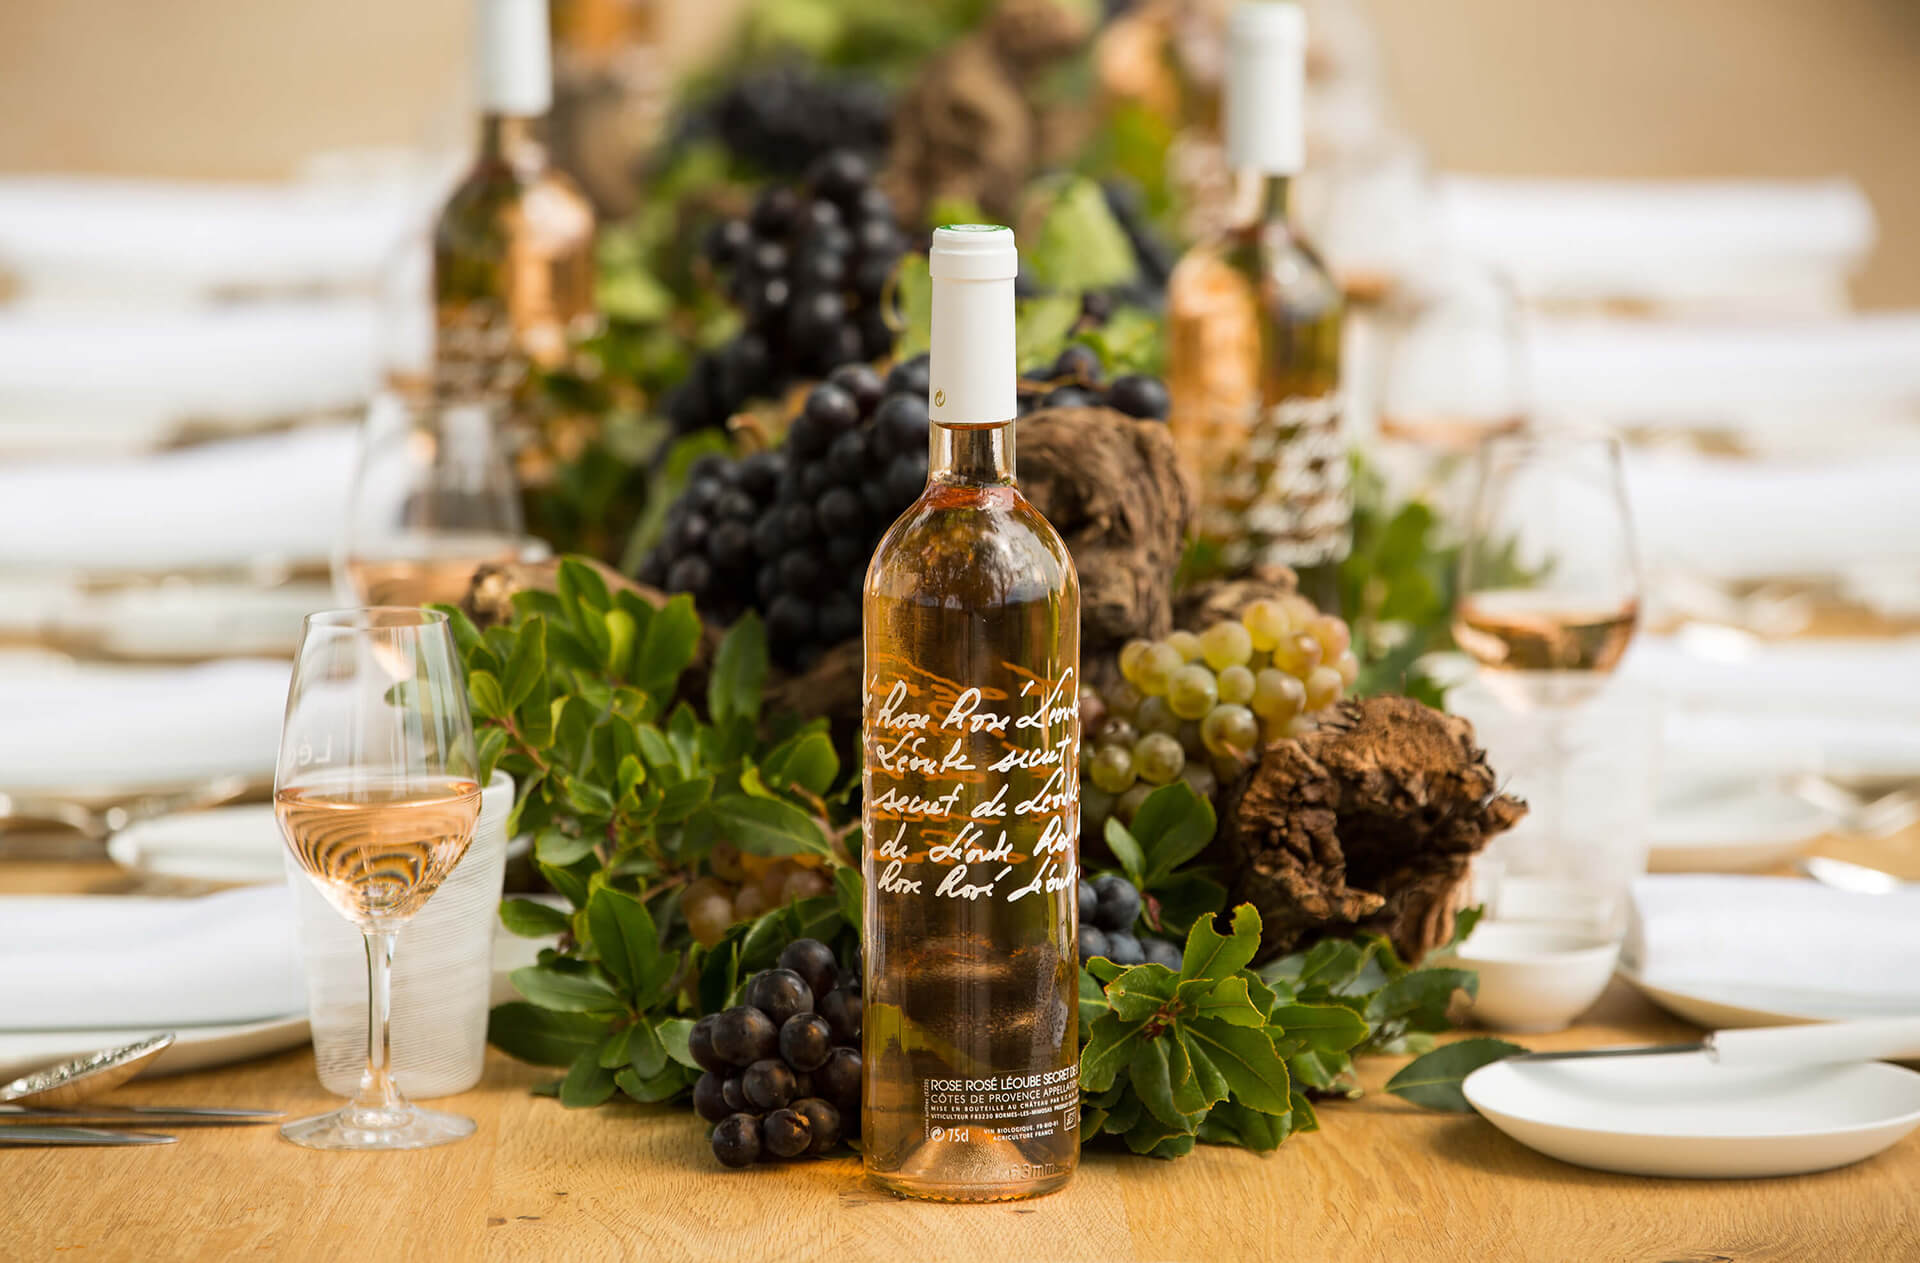 Chateau Leoube, Rose, Wine, South of France, Bamford, Organic, Table, Beautiful